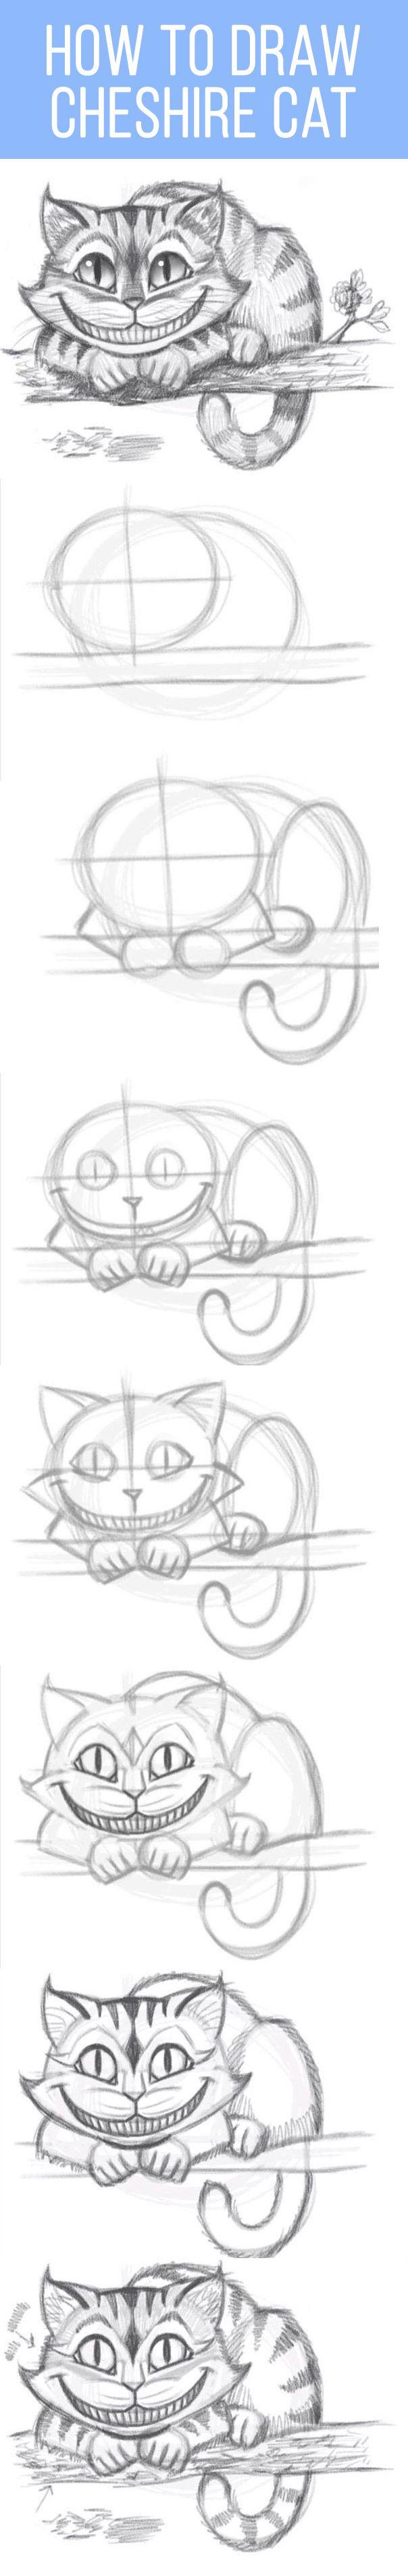 How To Draw Cheshire Cat Kreslenie Navody Pinterest Kreslit